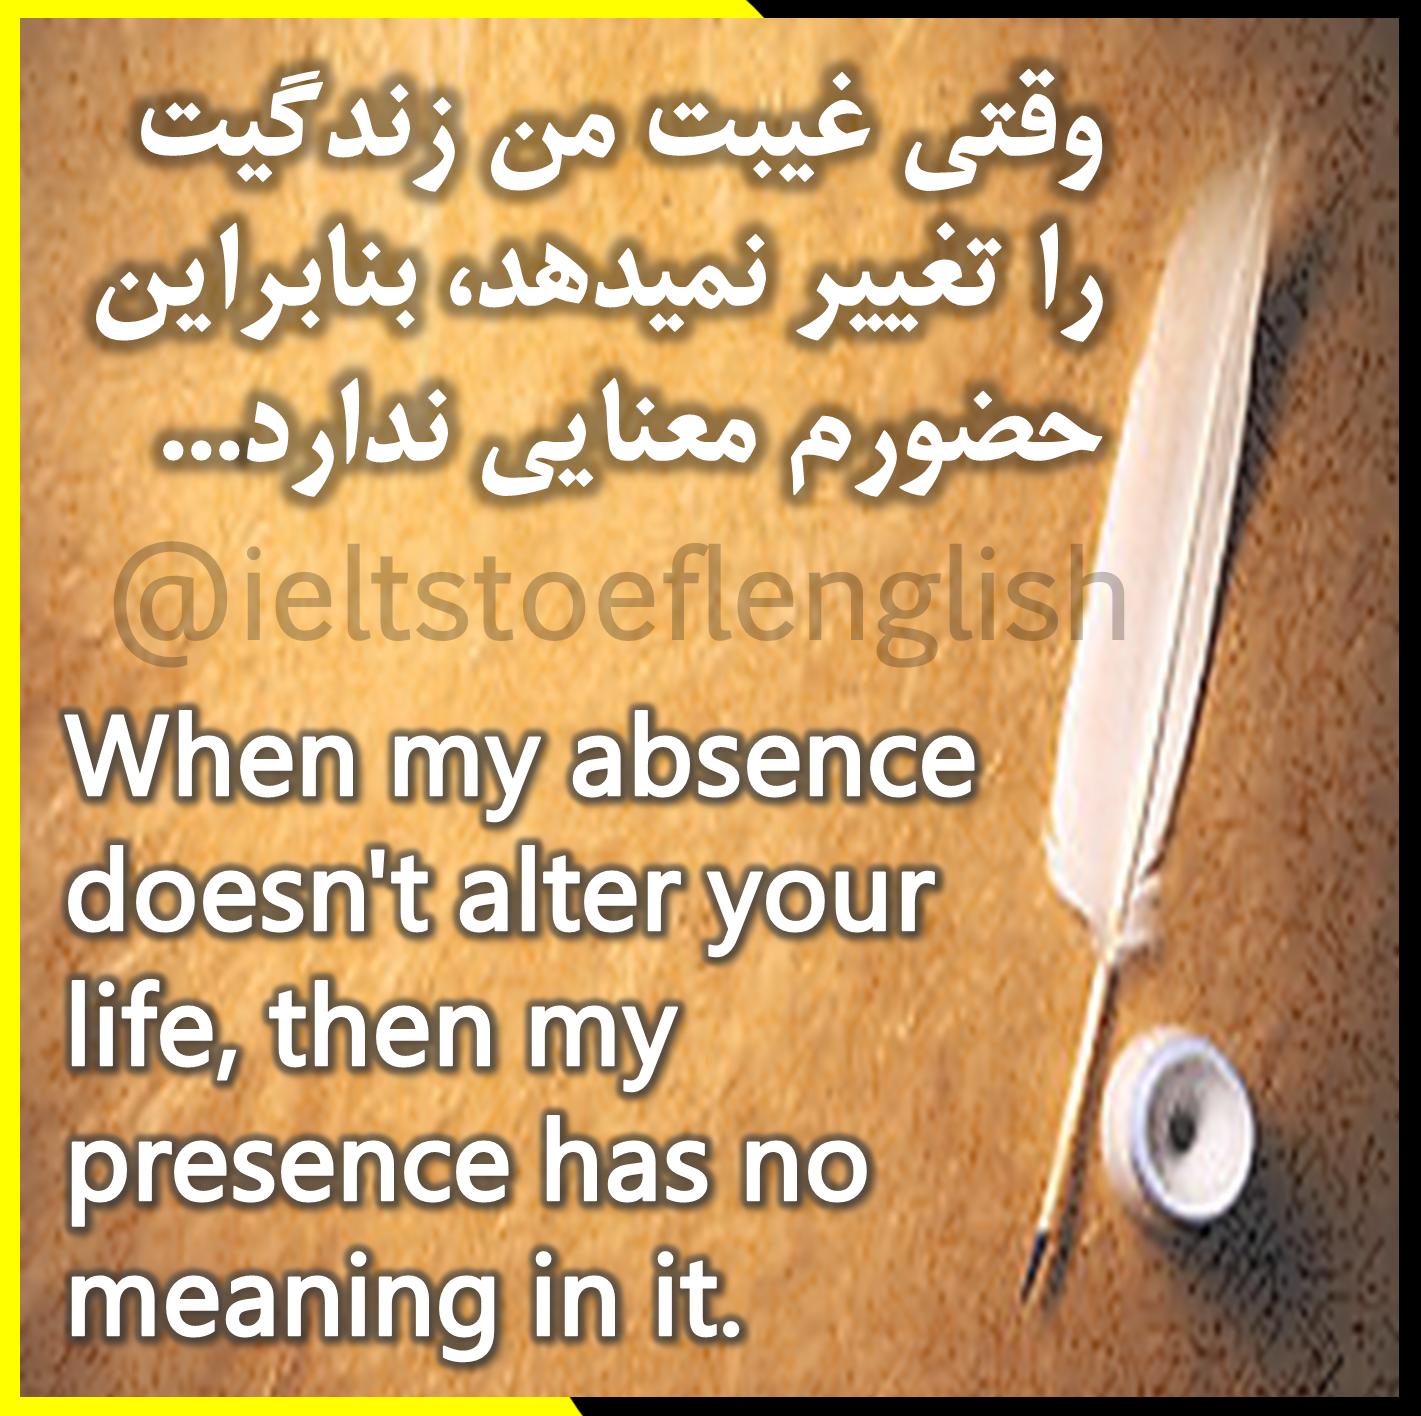 English Quotesجملات زیبا گزین گویه ها و سخنان بزرگان به زبان انگلیسی همراه با معنی فارسی دو زبانه کلاس Wise Words Quotes Learn Persian Good Sentences